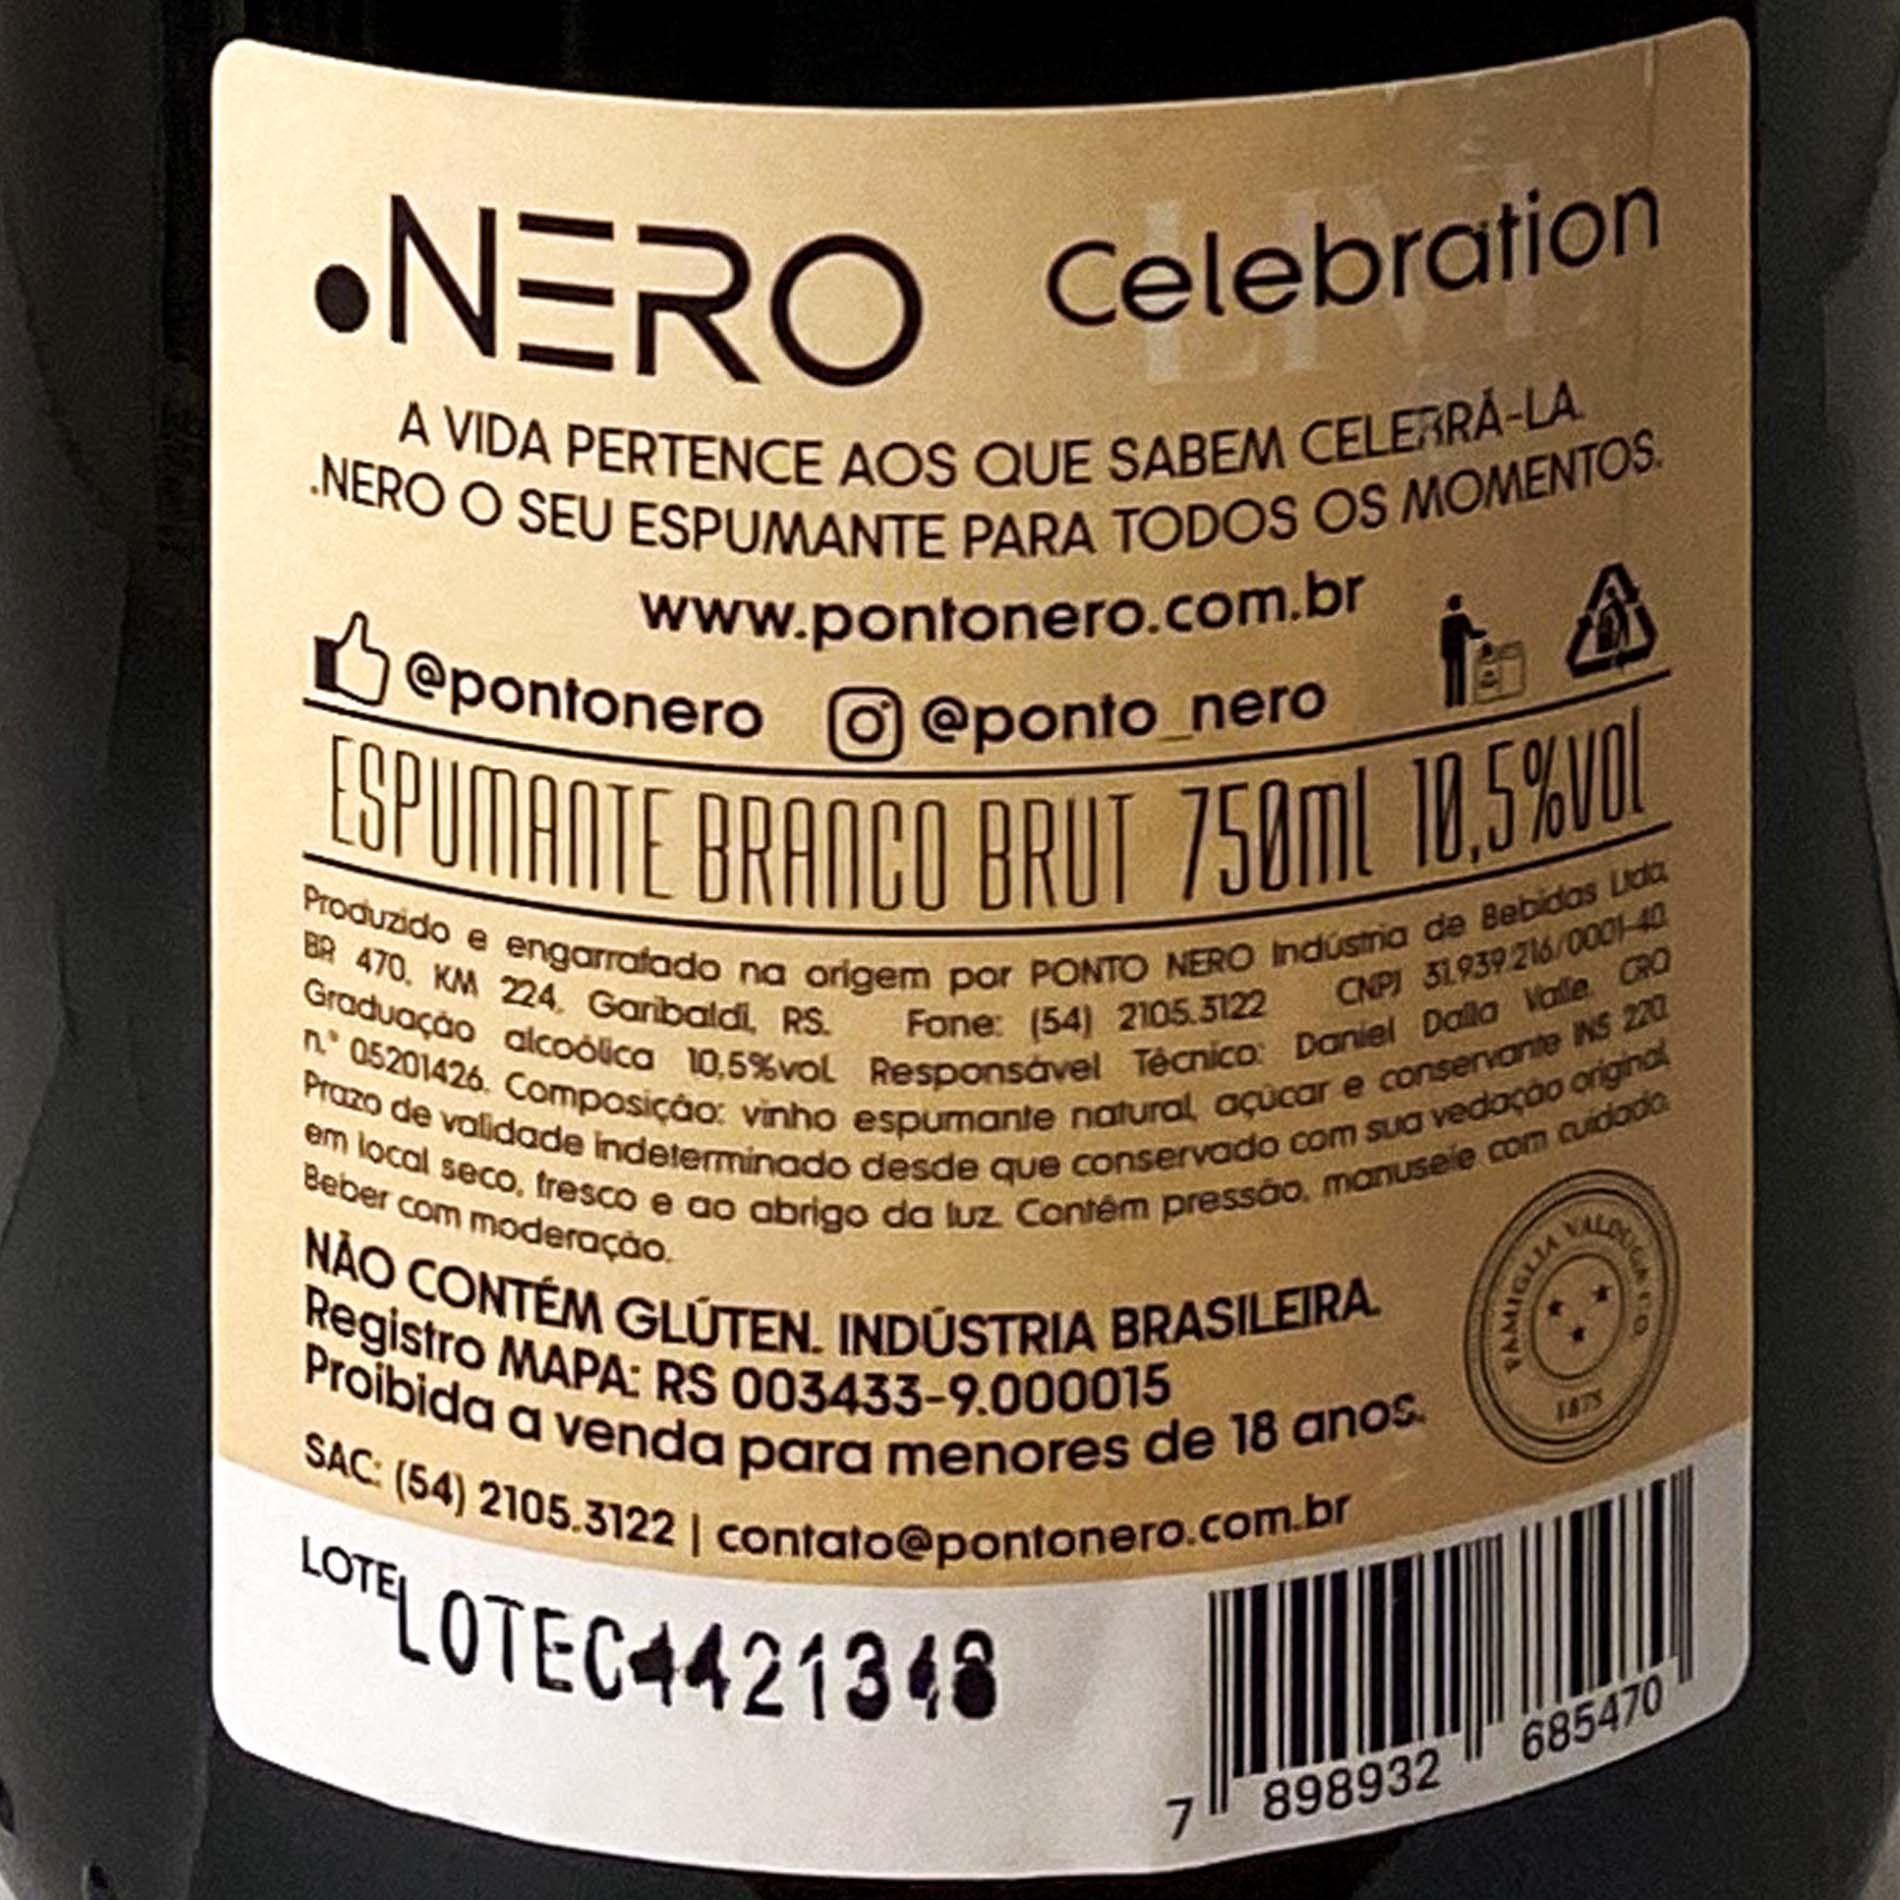 Ponto Nero Live Celebration Brut  - Vinerize